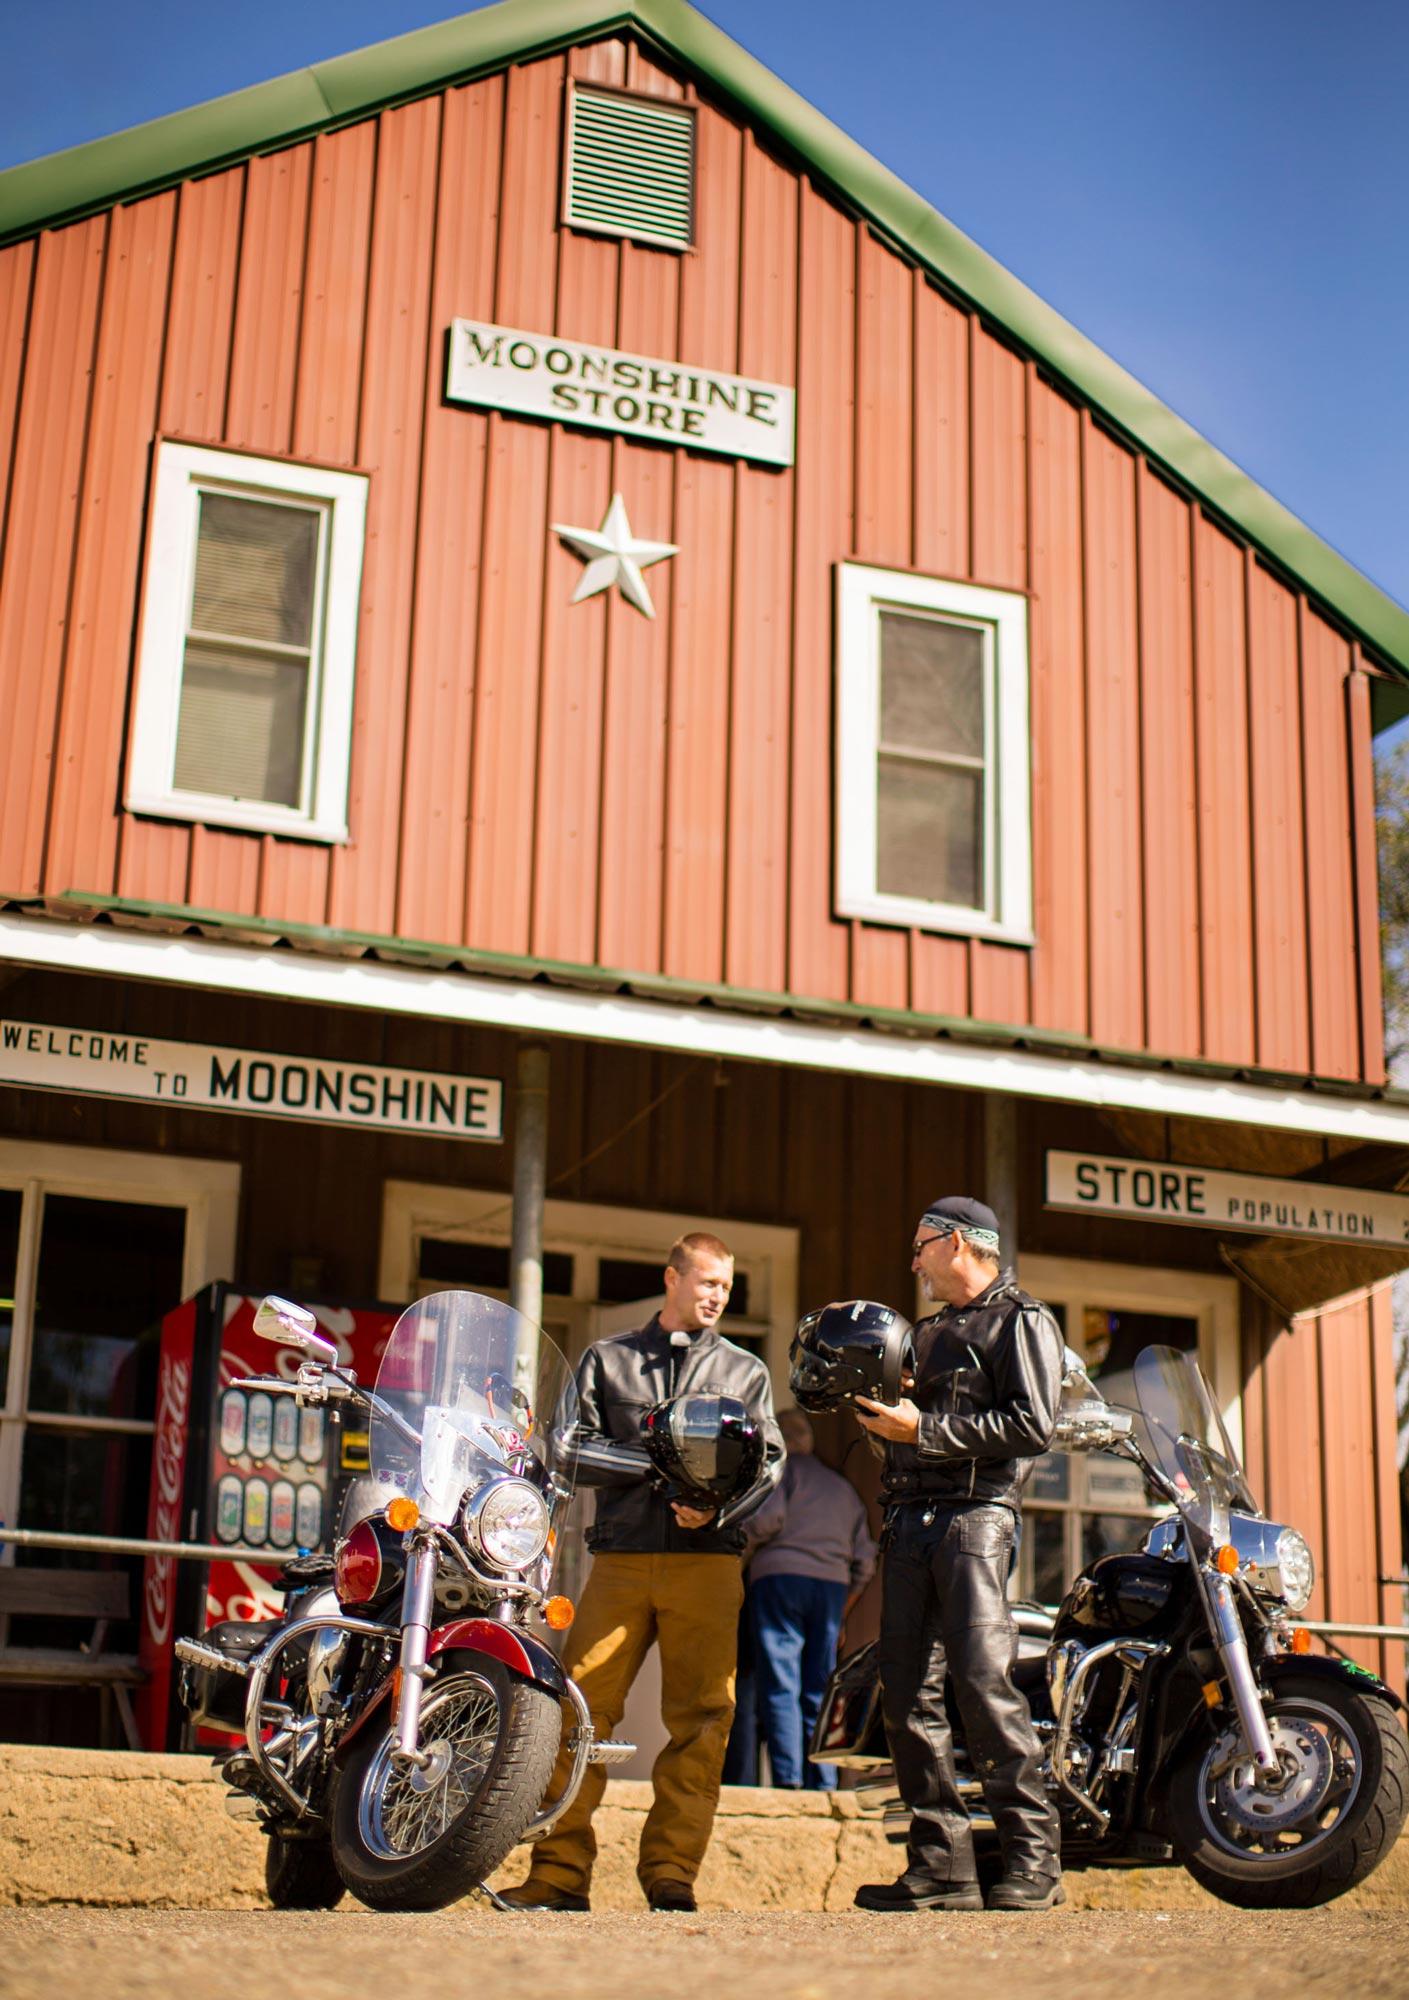 Moonshine Store